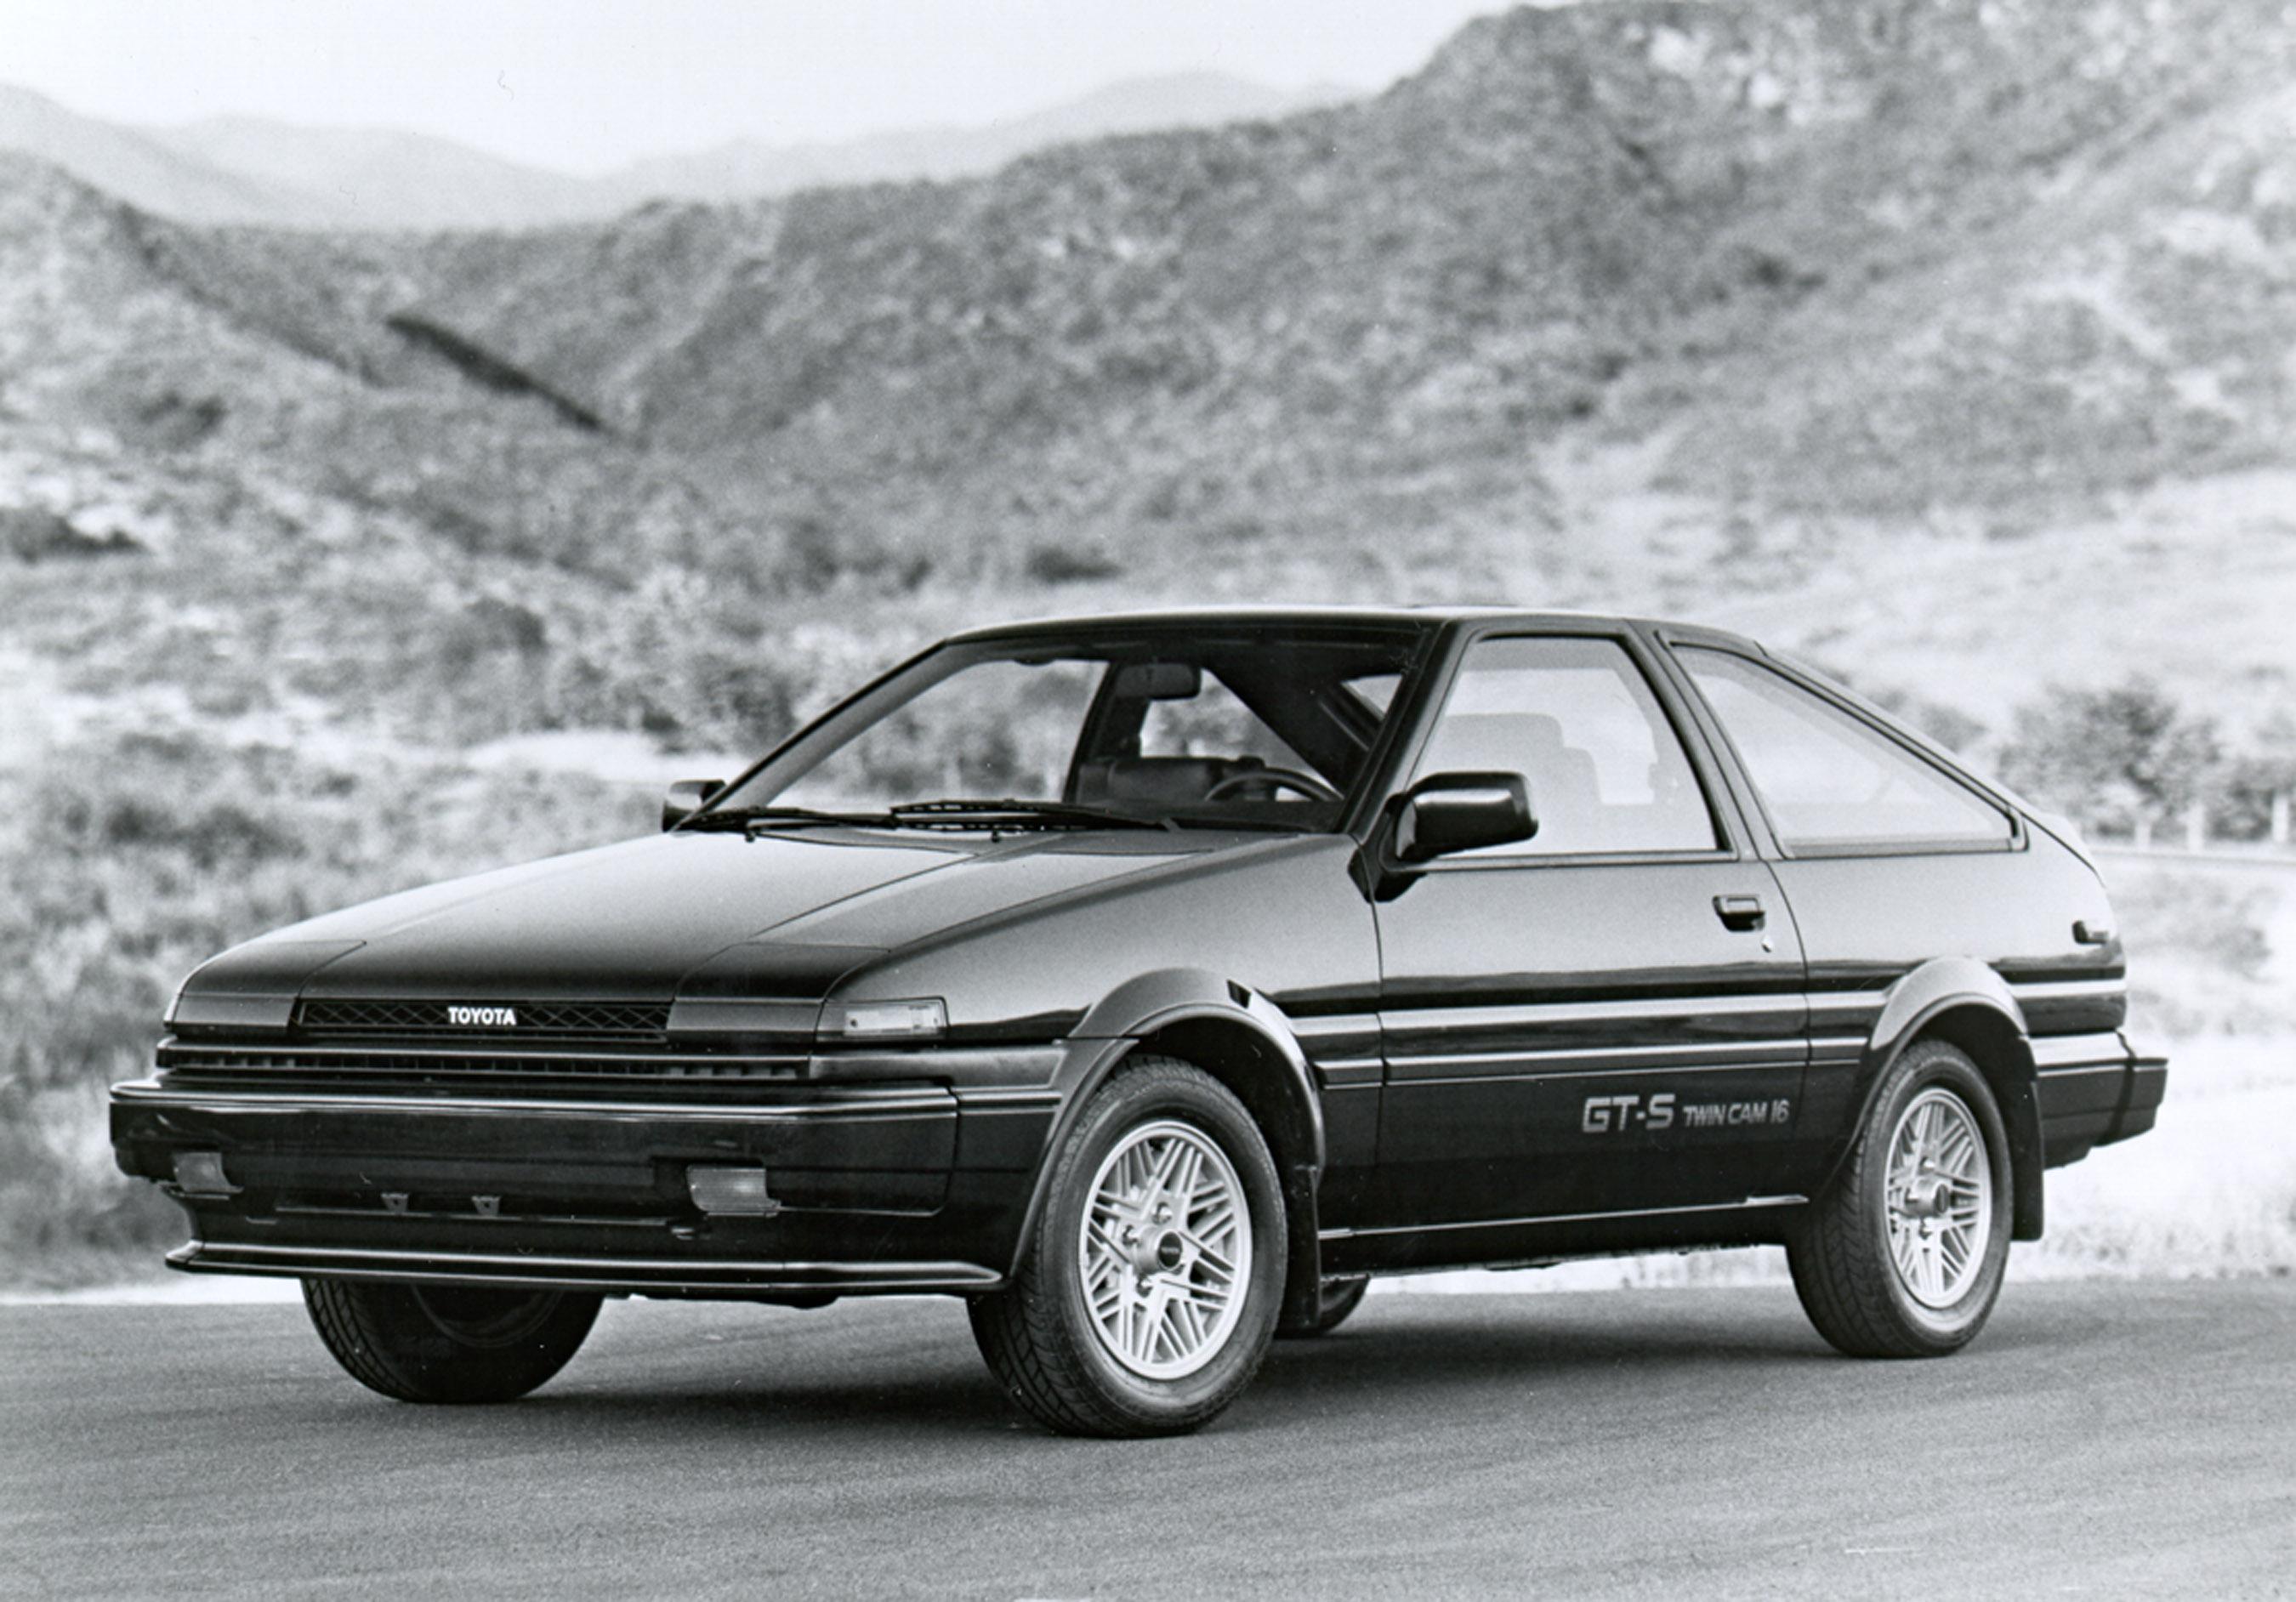 1986 Toyota Corolla GT-S Liftback